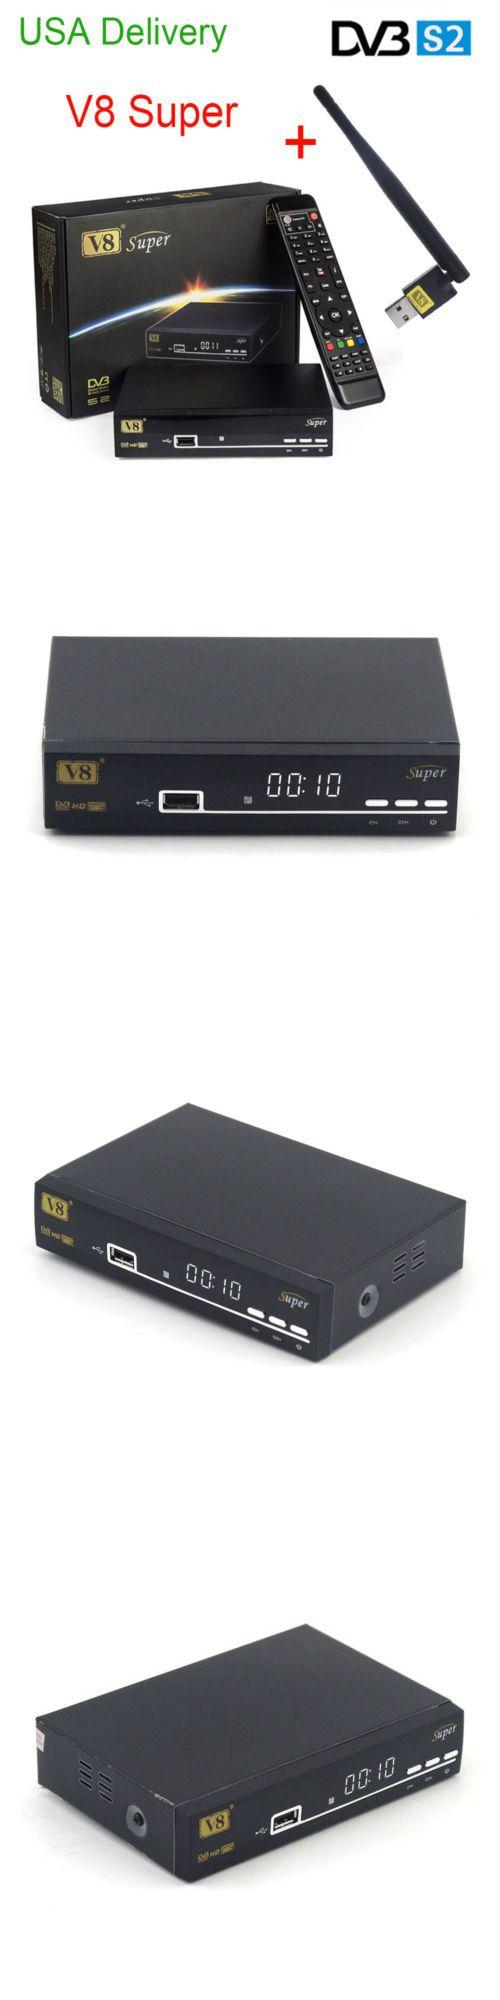 Satellite TV Receivers: Hd Freesat V8 Super Dvb-S2 Digital Satellite Receiver Full 1080P With Usb Wifi U BUY IT NOW ONLY: $41.0